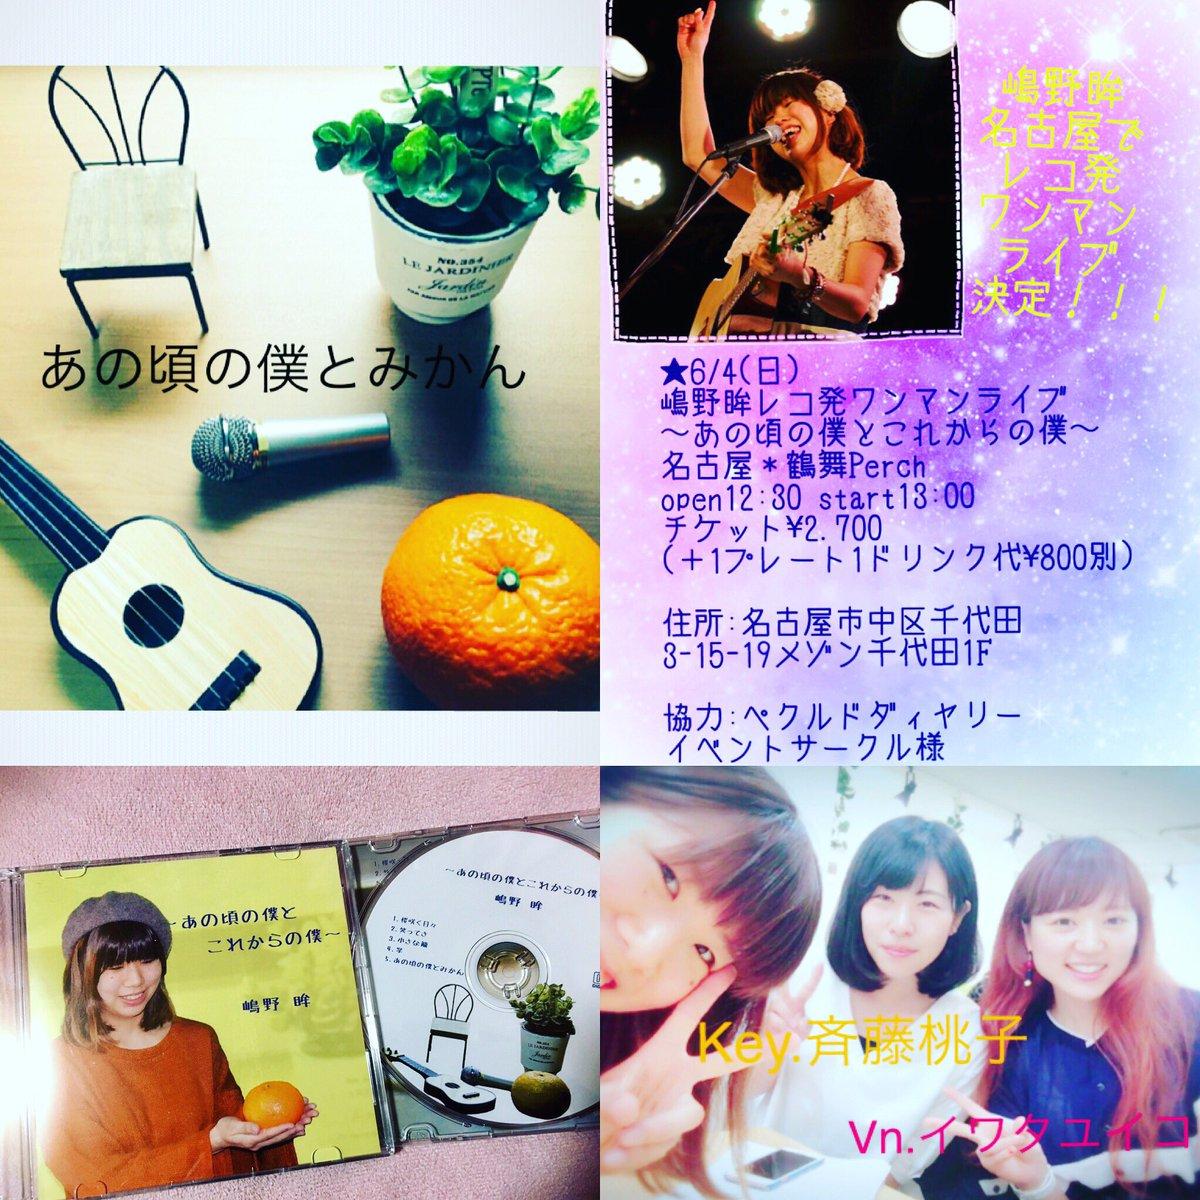 cd key fifa 13